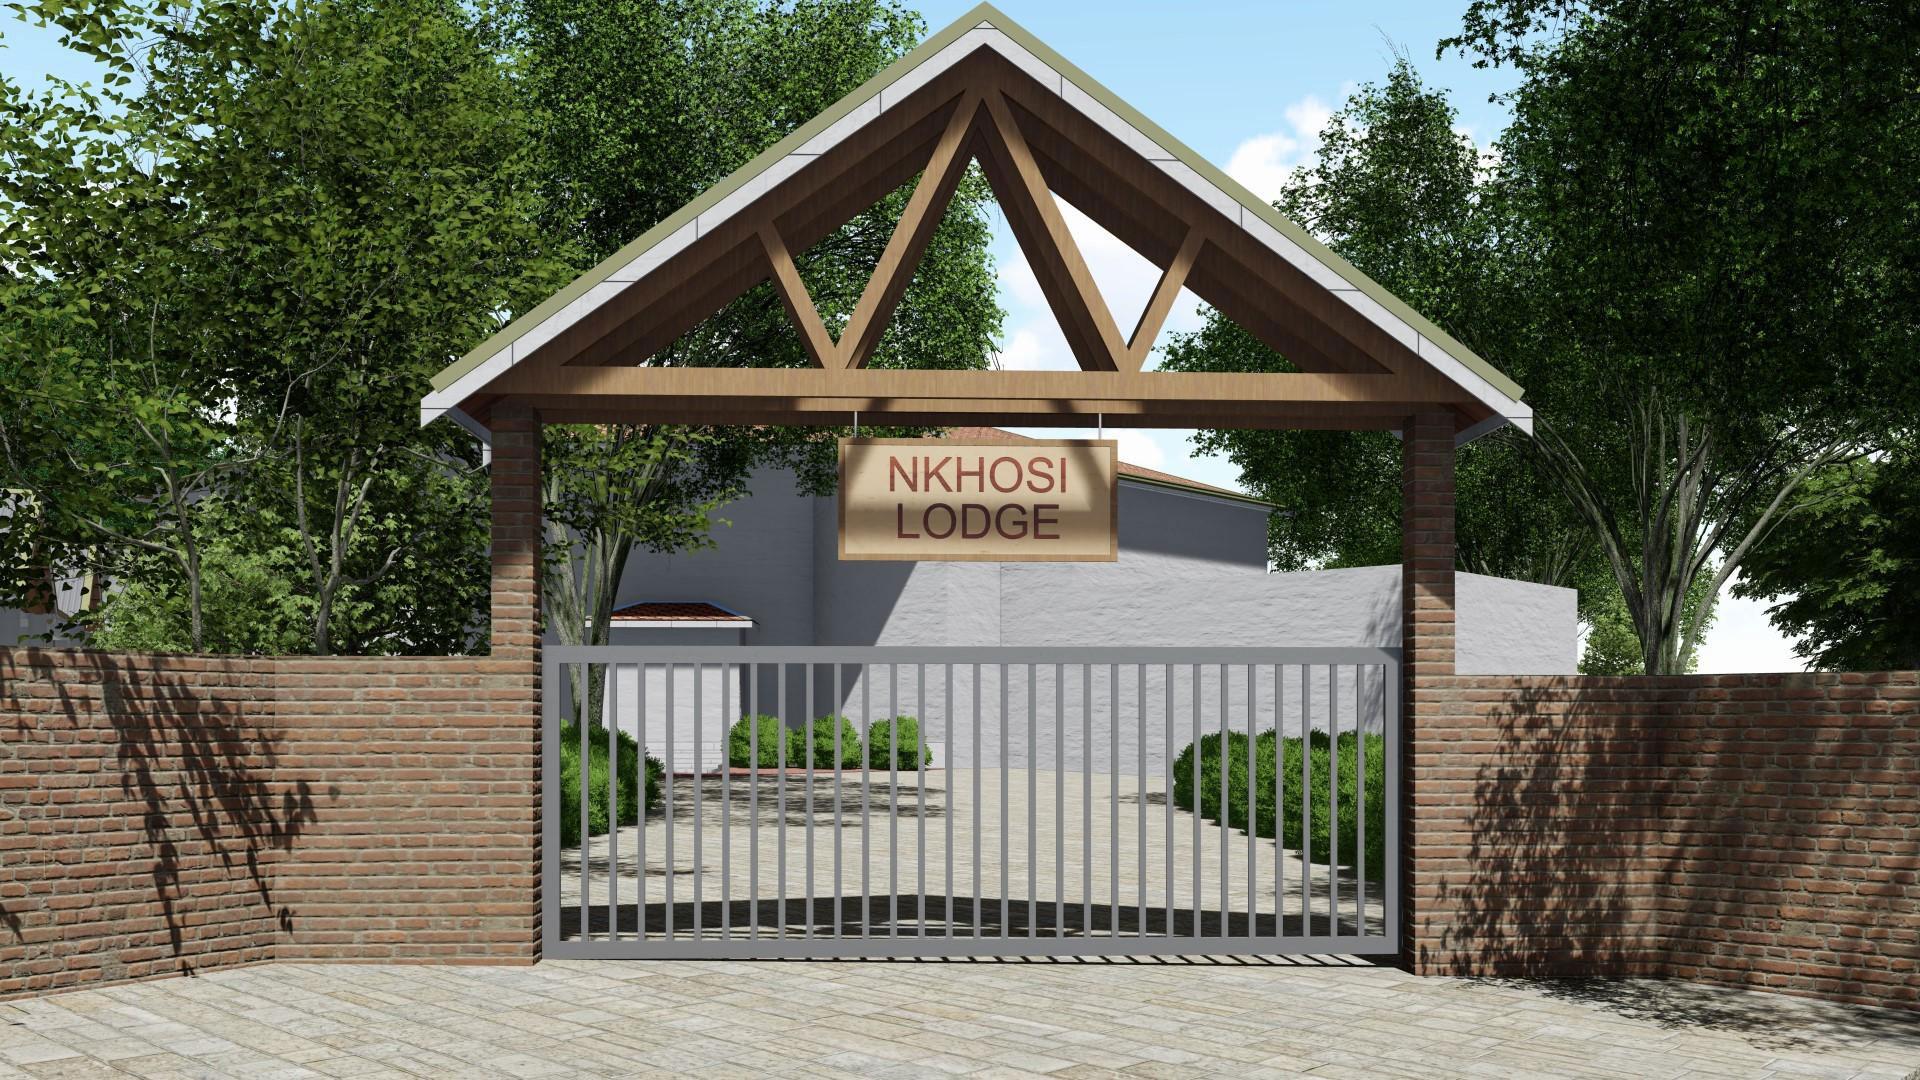 Nkhosi-Lodge